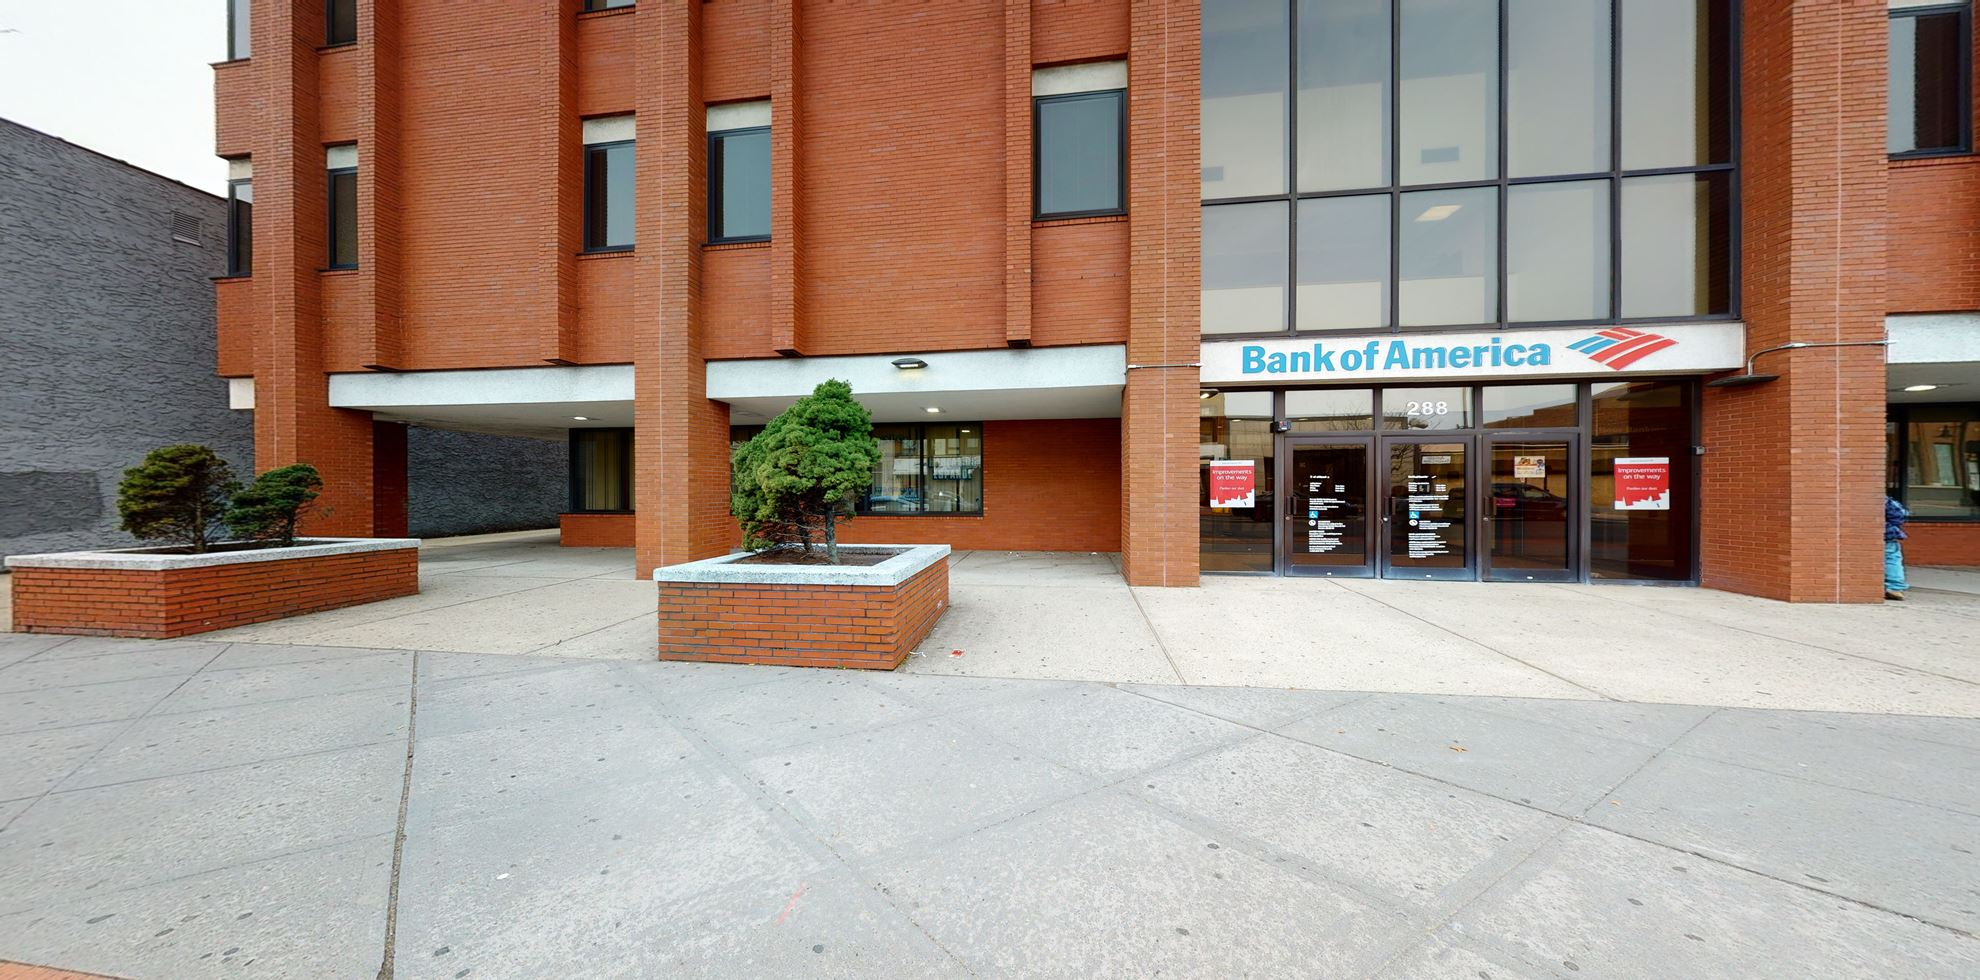 Bank of America financial center with drive-thru ATM   288 N Broad St, Elizabeth, NJ 07208